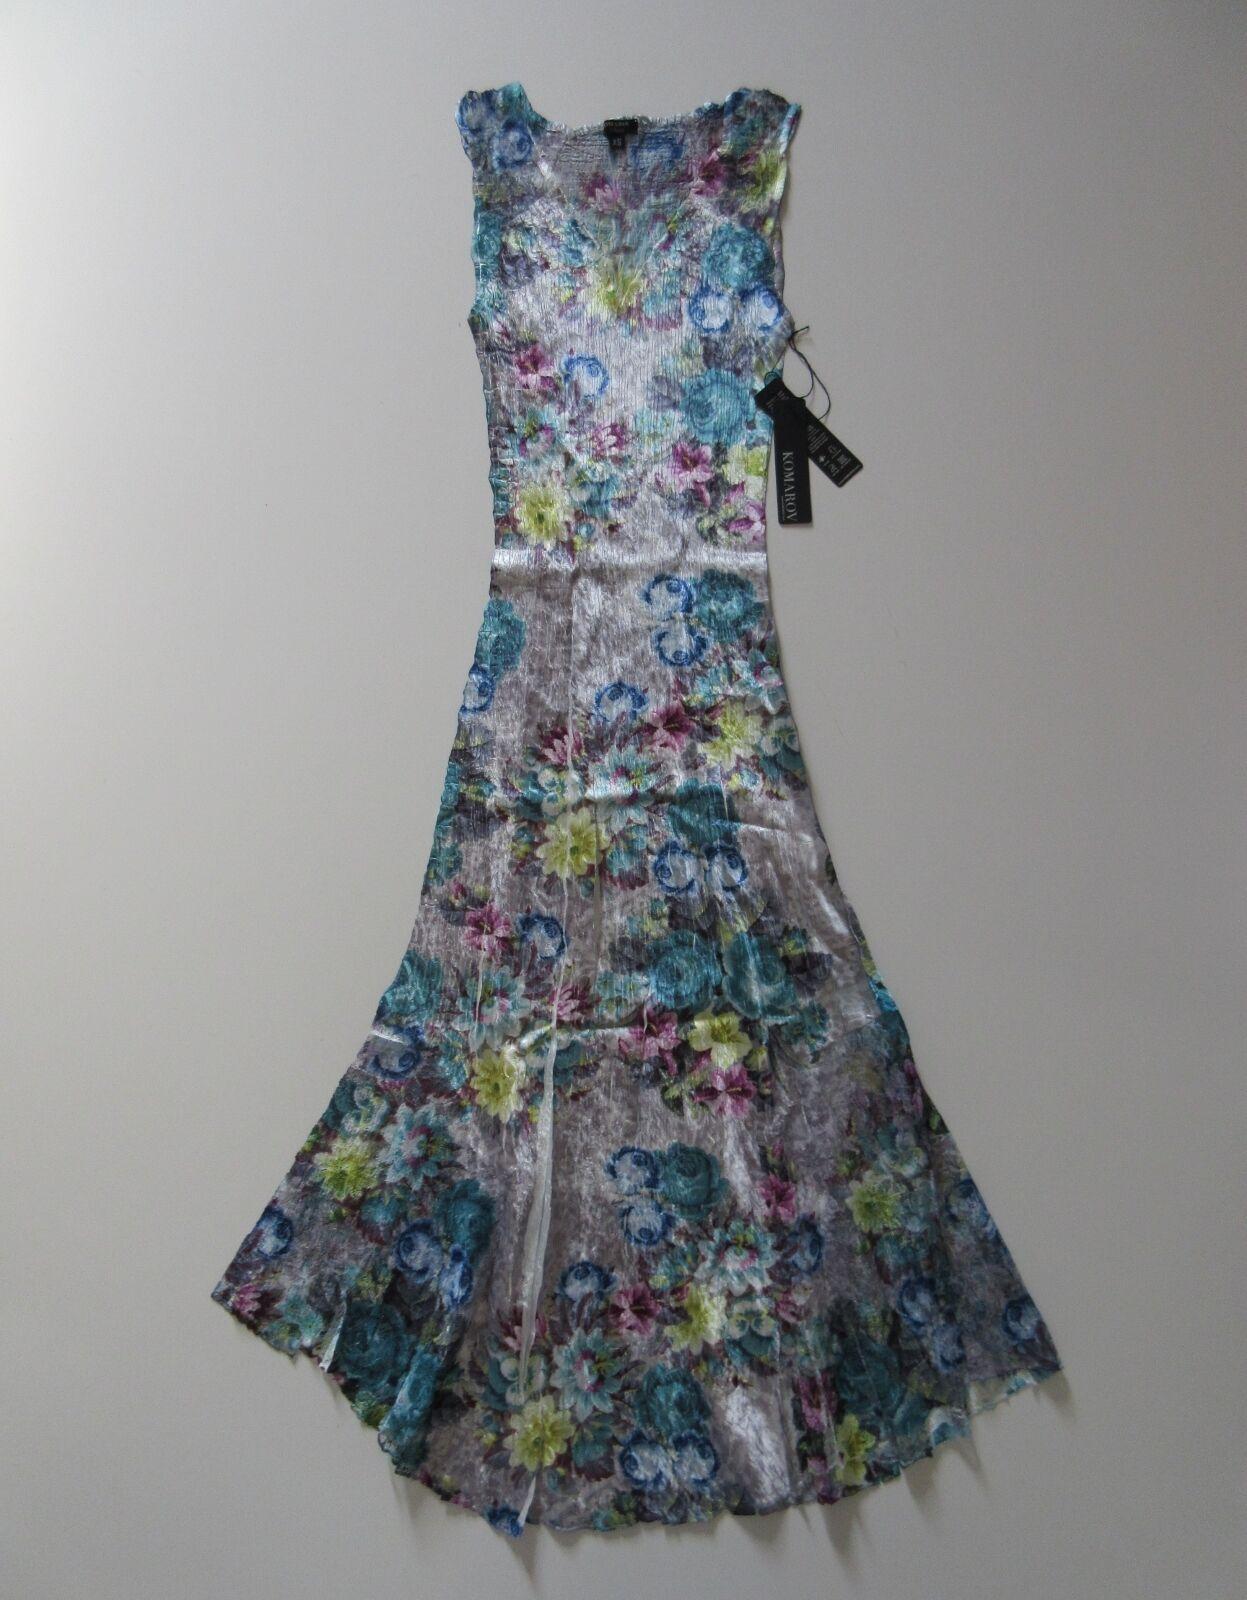 NWT KOMAROV lila Floral Lace Trimmed Crinkle Sleeveless V-Neck Dress XS